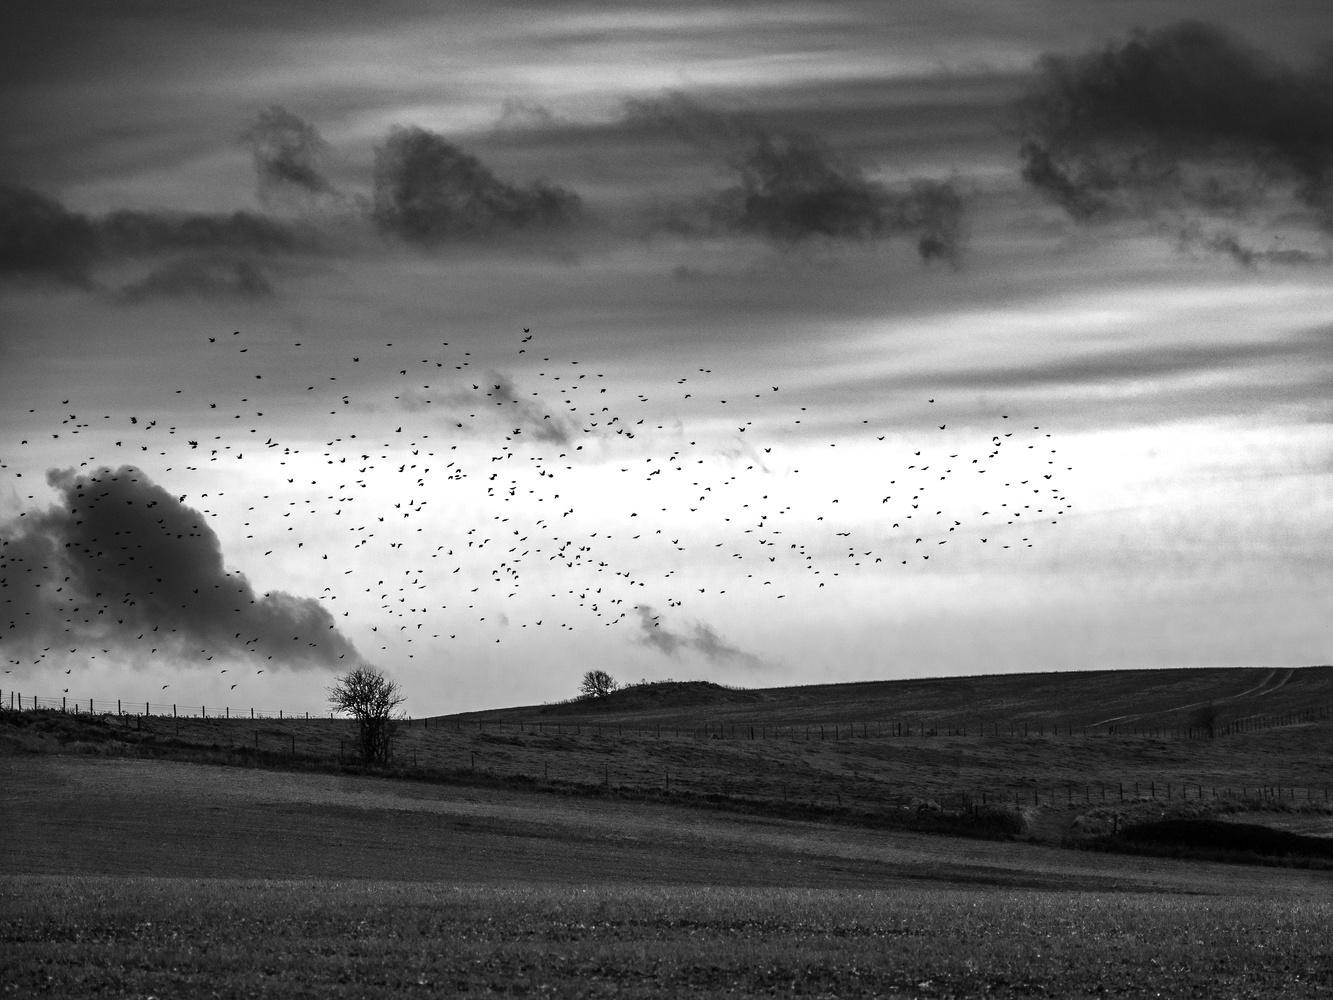 Silence by Tomasz Kowalski